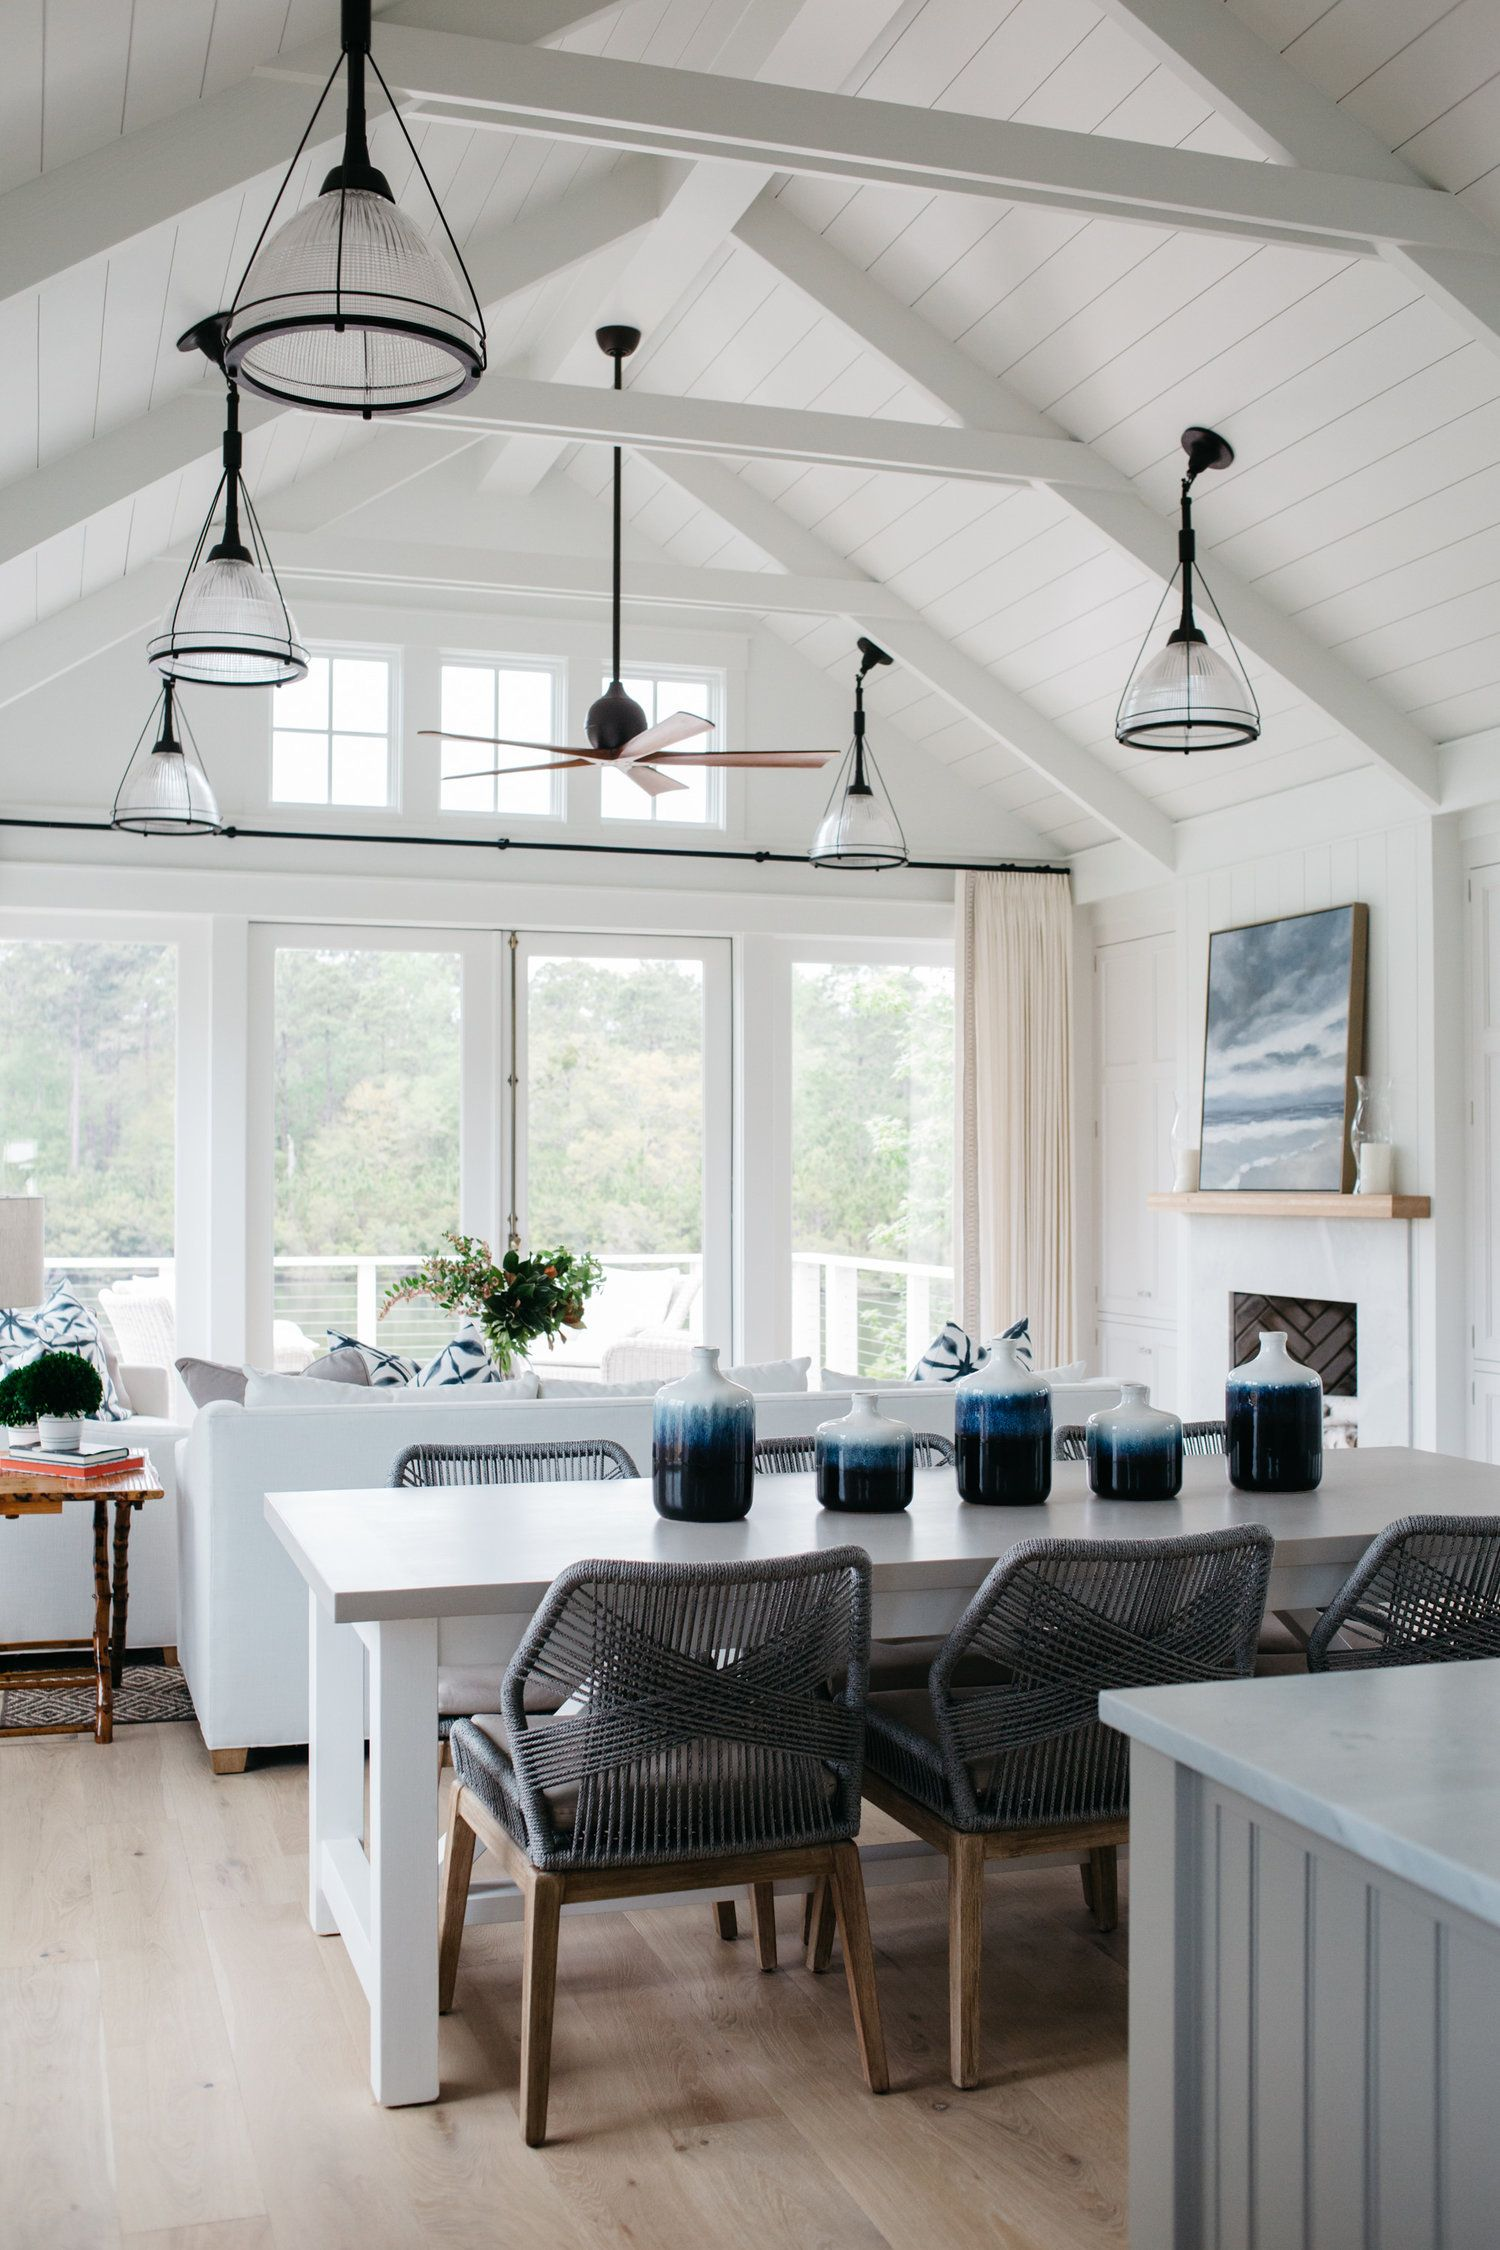 Coastal Cottage Interior Design Inspiration Part 1 {Get